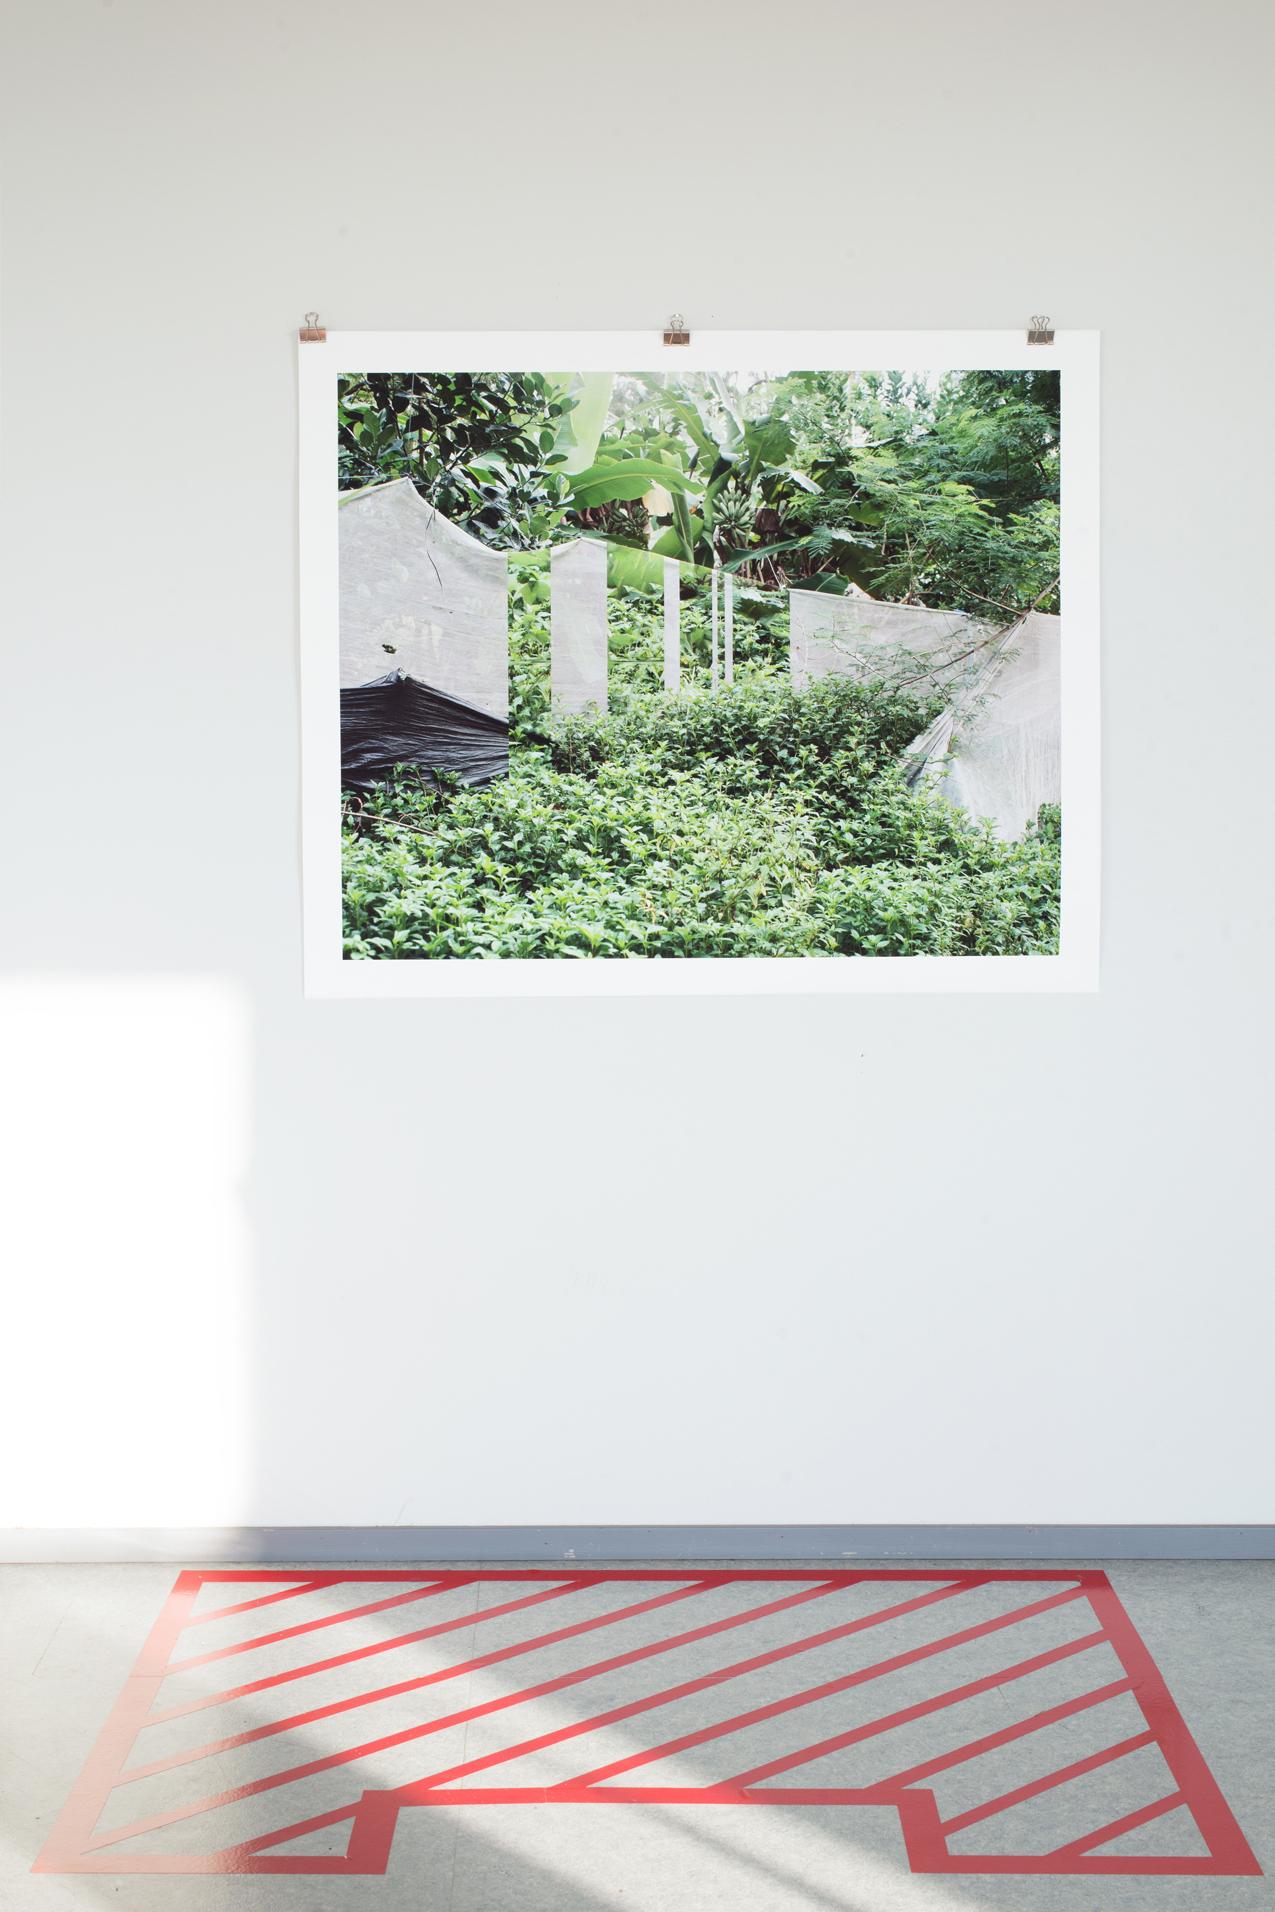 4_Unfurnished-Unfinished exhibition installation_060.jpg